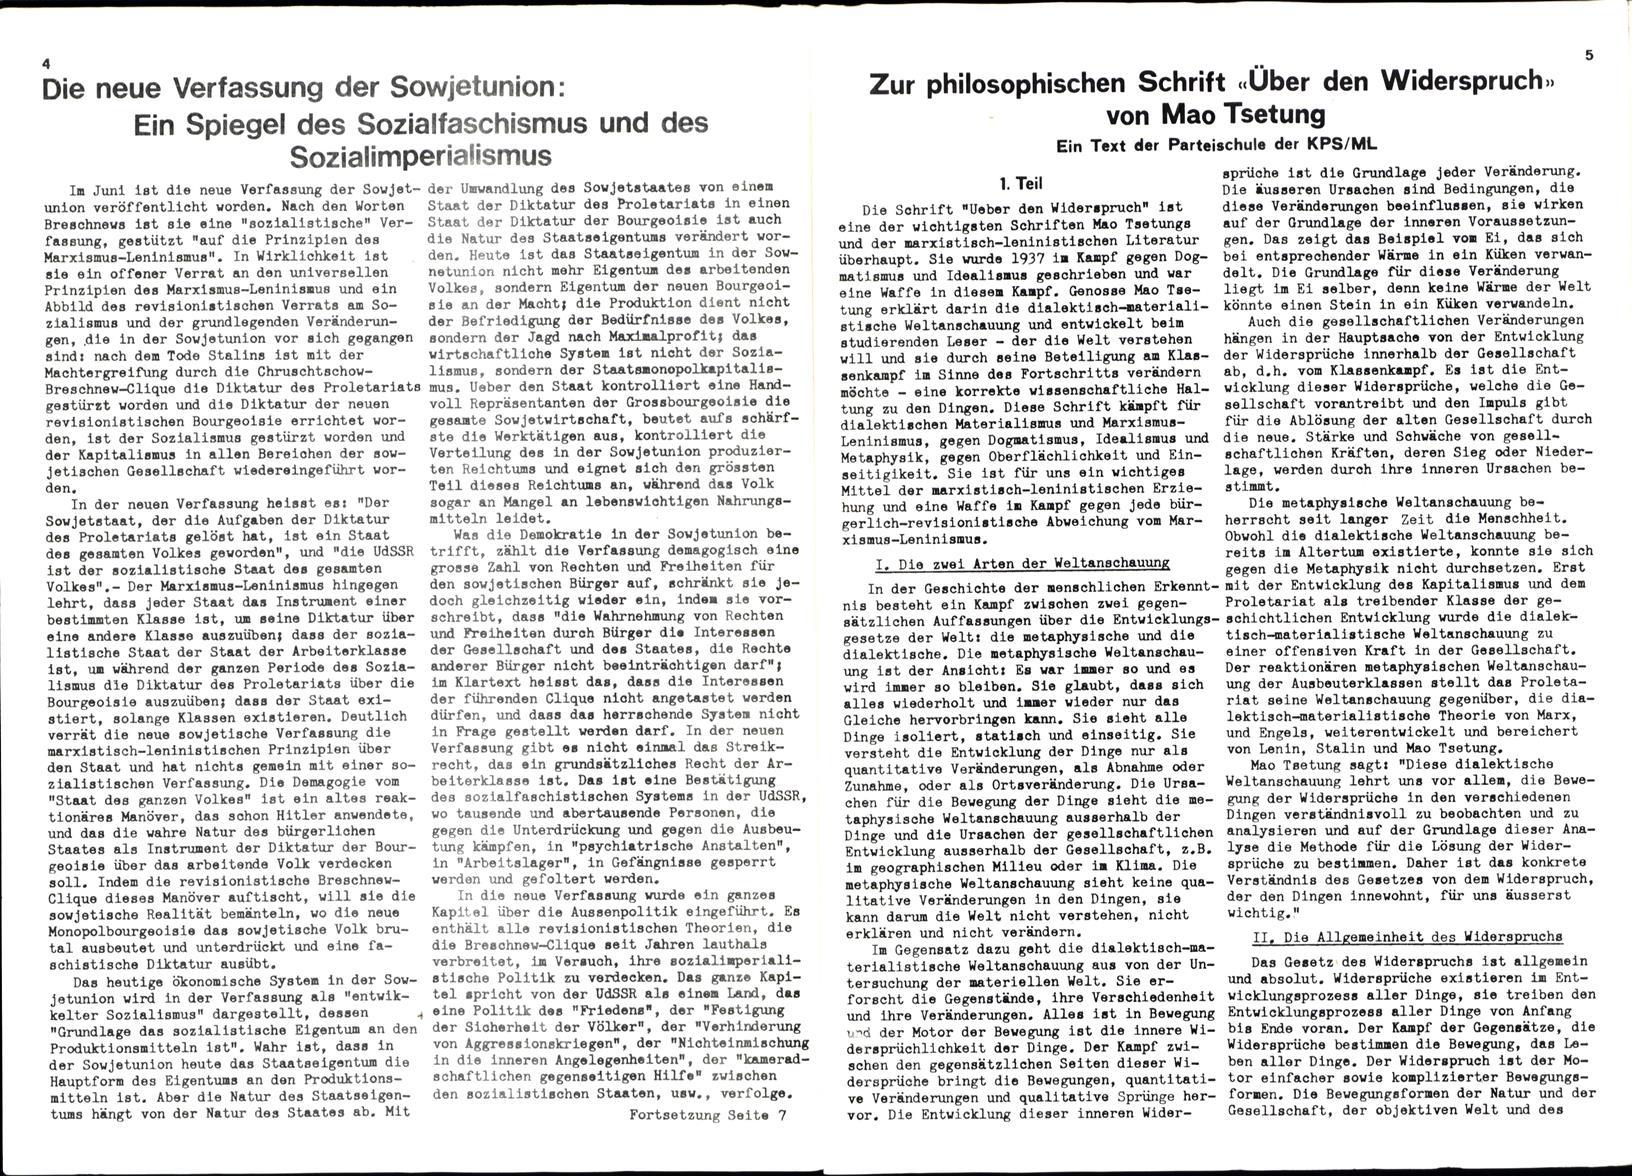 Schweiz_KPSML_Oktober_19770800_113_003